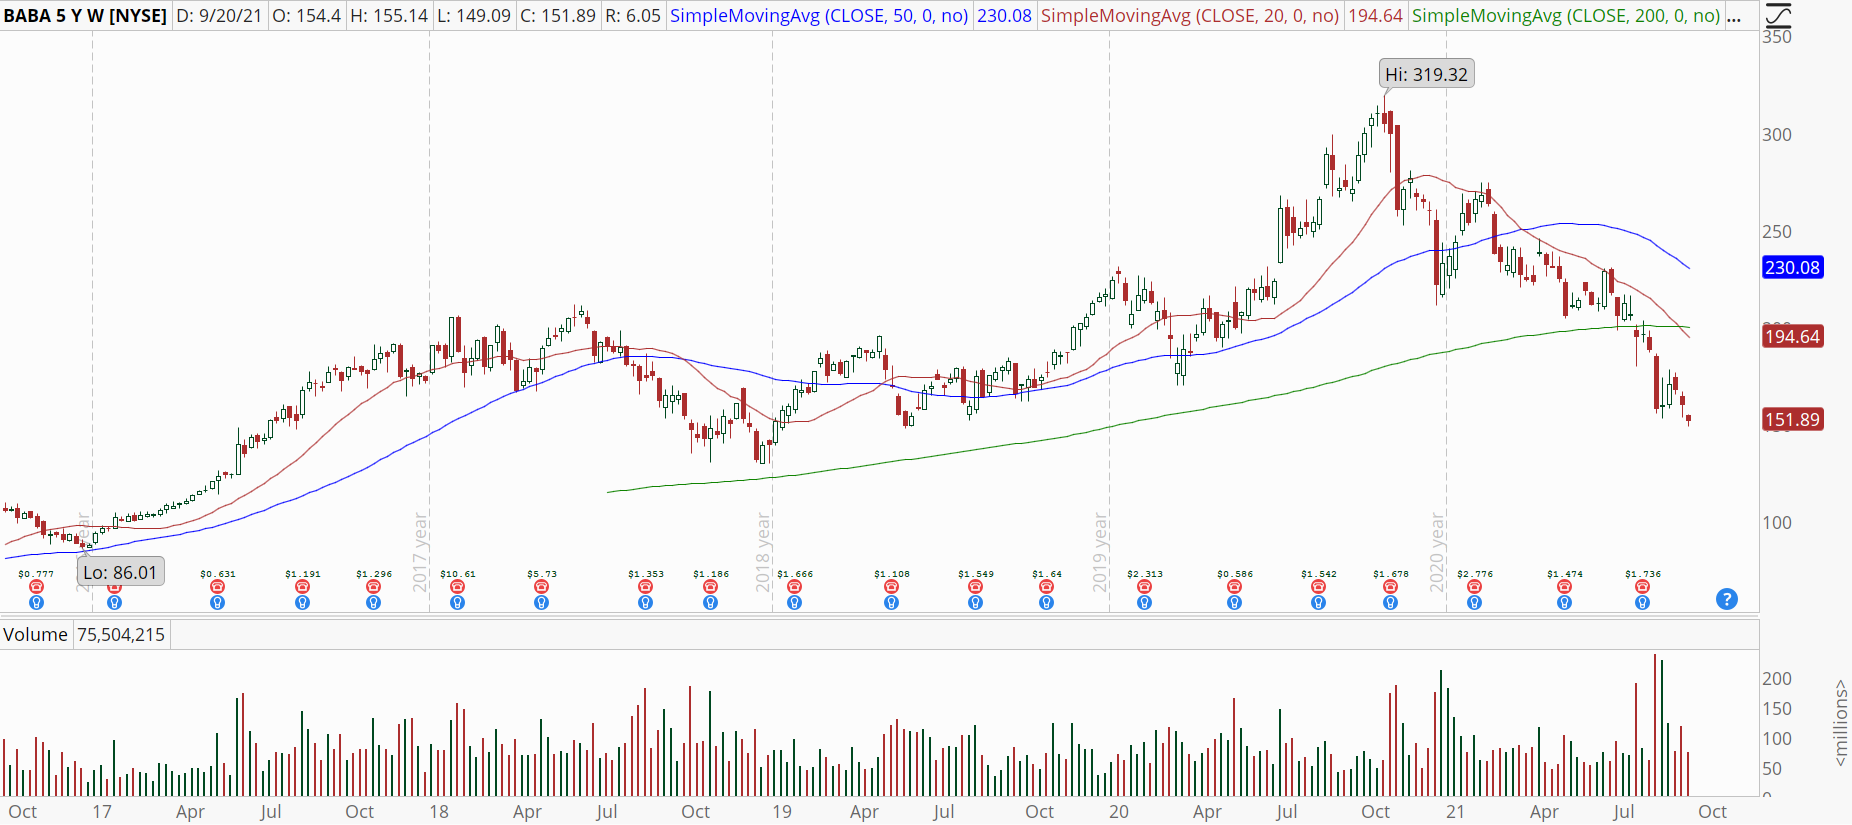 Alibaba (BABA) weekly stock chart with downtrend.